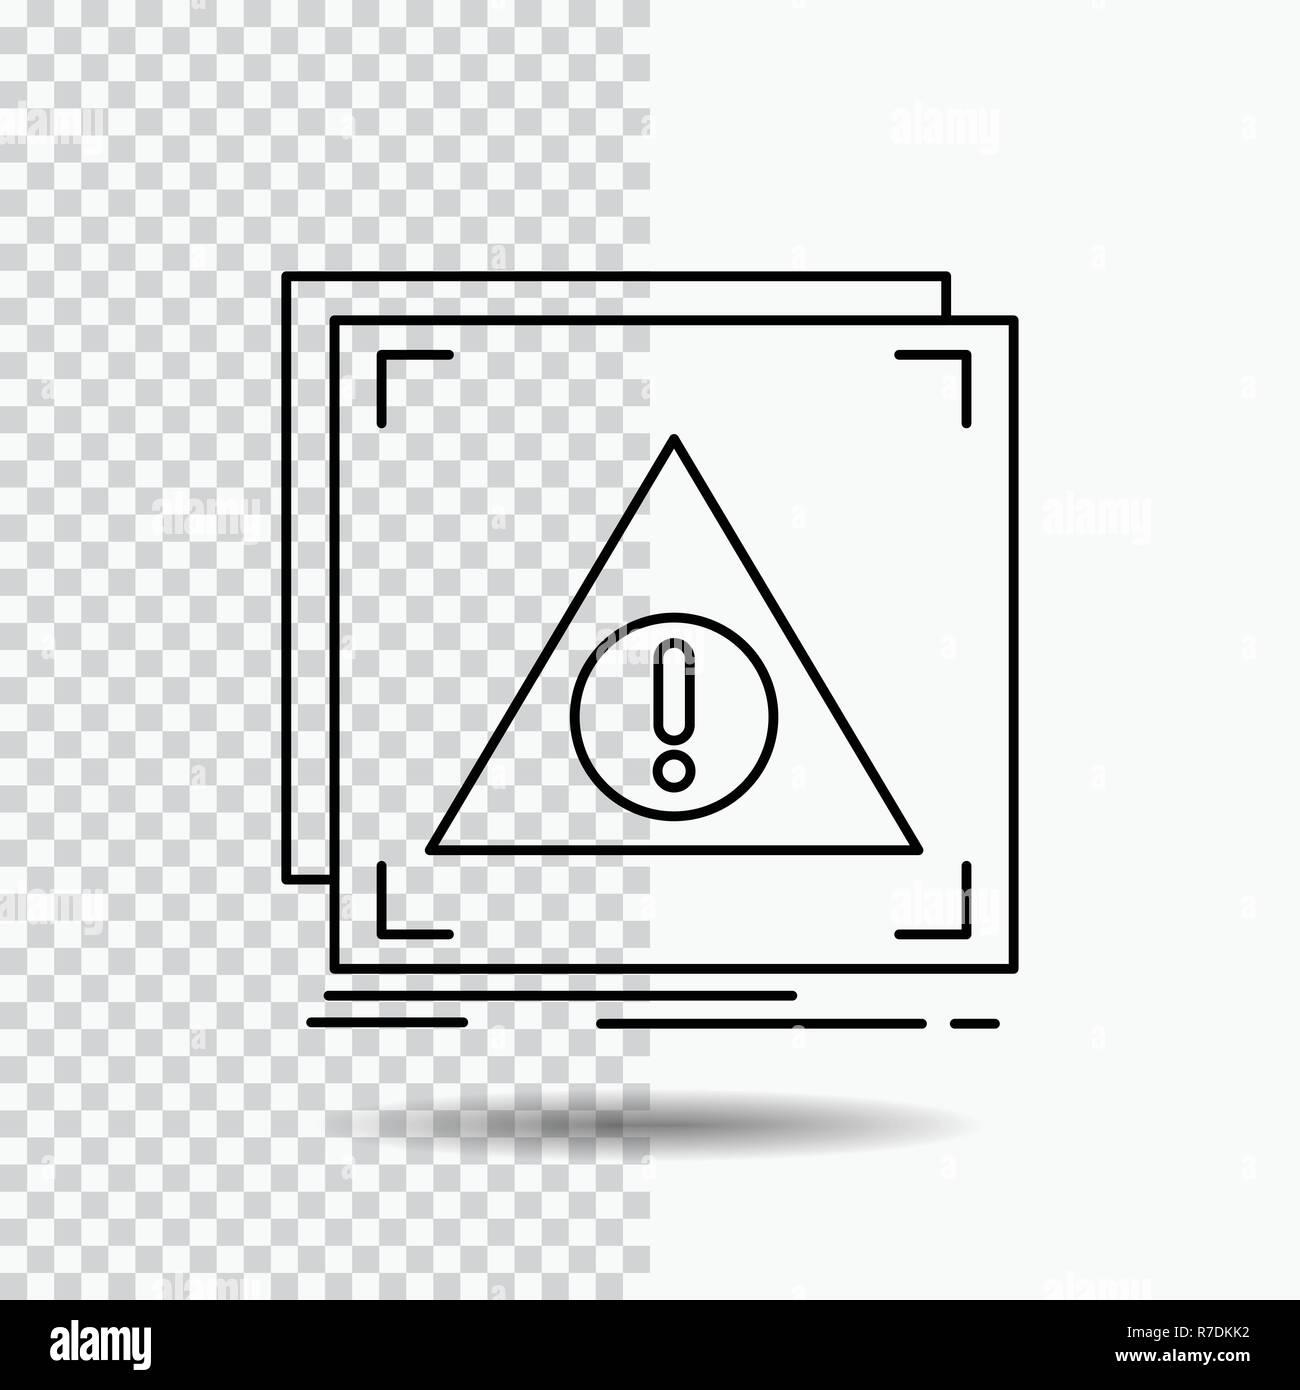 Error, Application, Denied, server, alert Line Icon on Transparent Background. Black Icon Vector Illustration - Stock Image